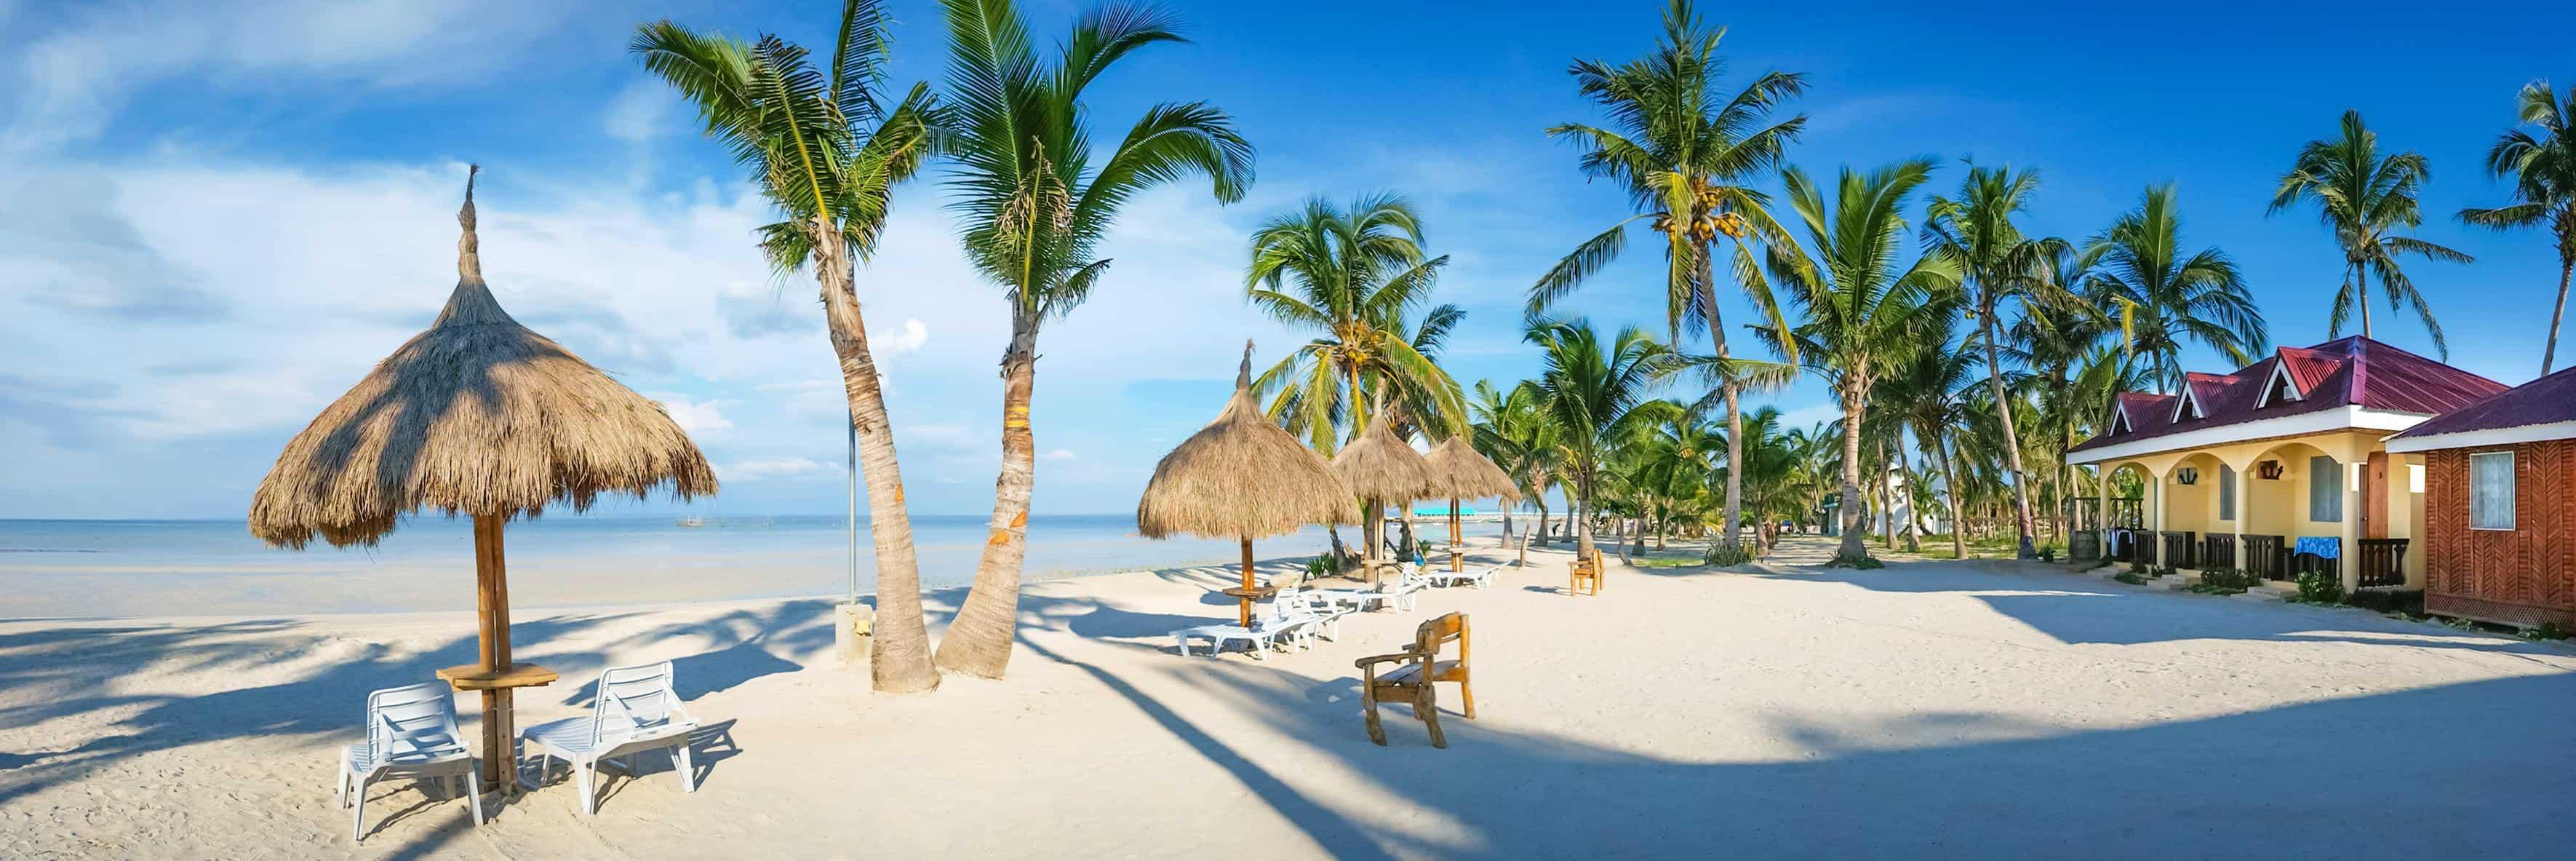 Beach Placid Resort Bantayan Cebu (3)